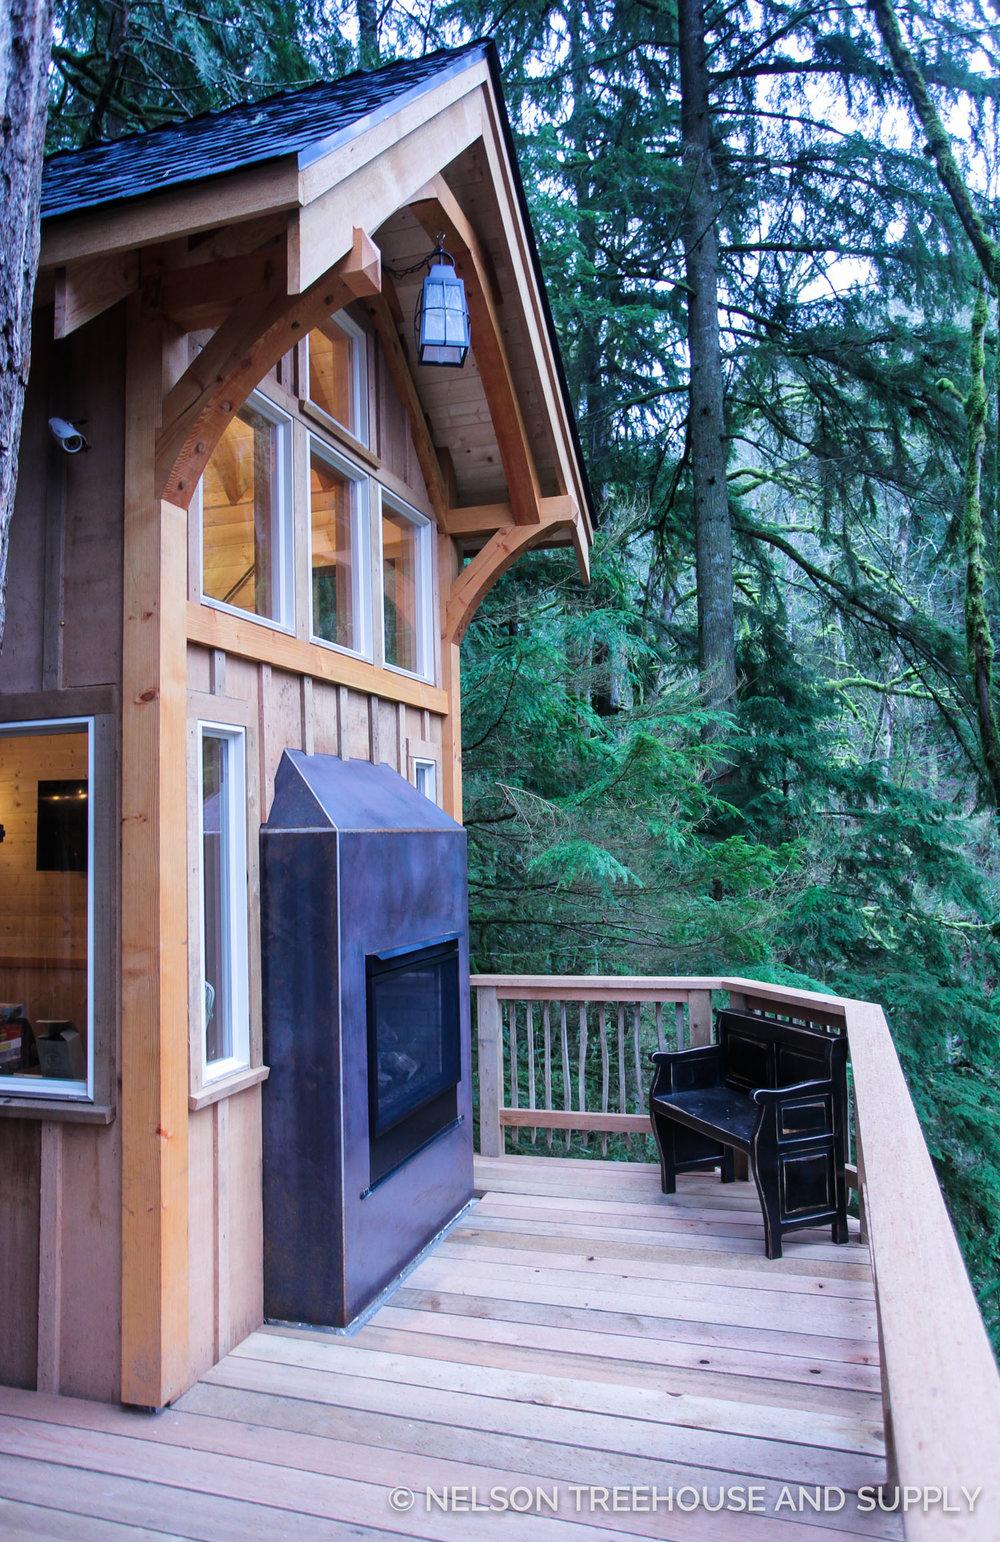 Nelson Treehouse Ski Lodge